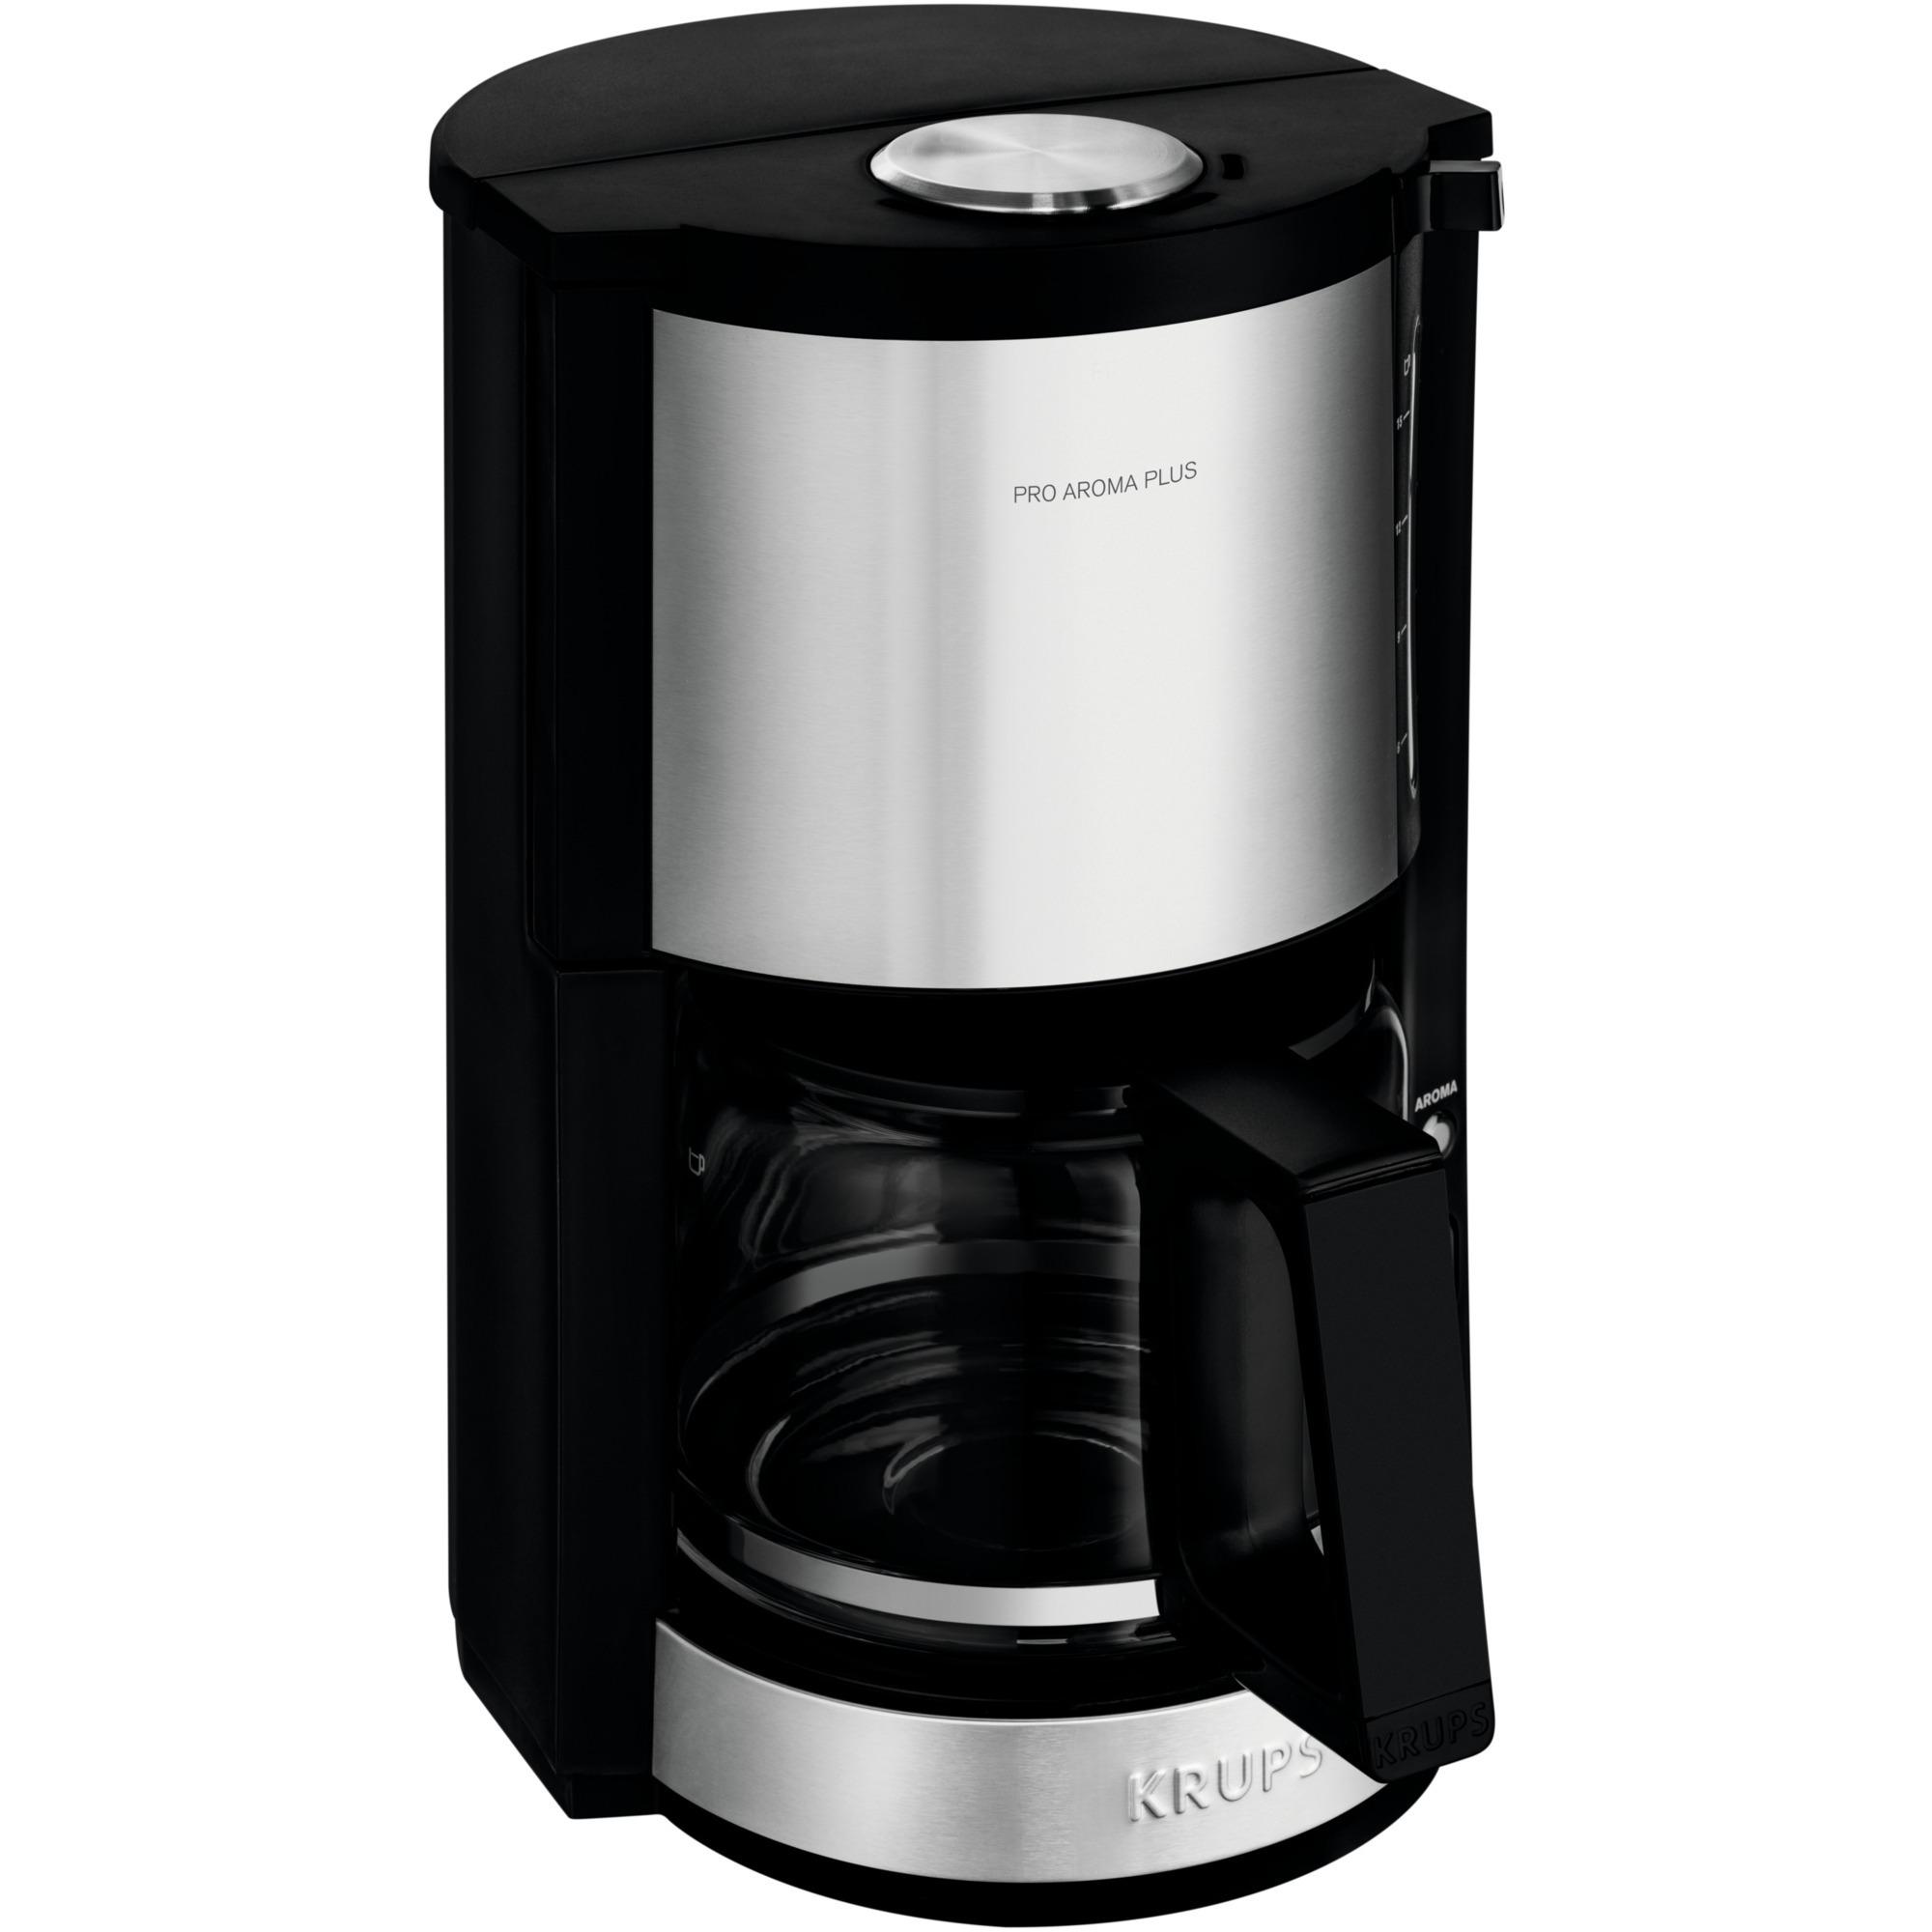 Frisk Krups ProAroma Plus Bordplade Dråbe kaffemaskine 1,25 L, Filter IL-53